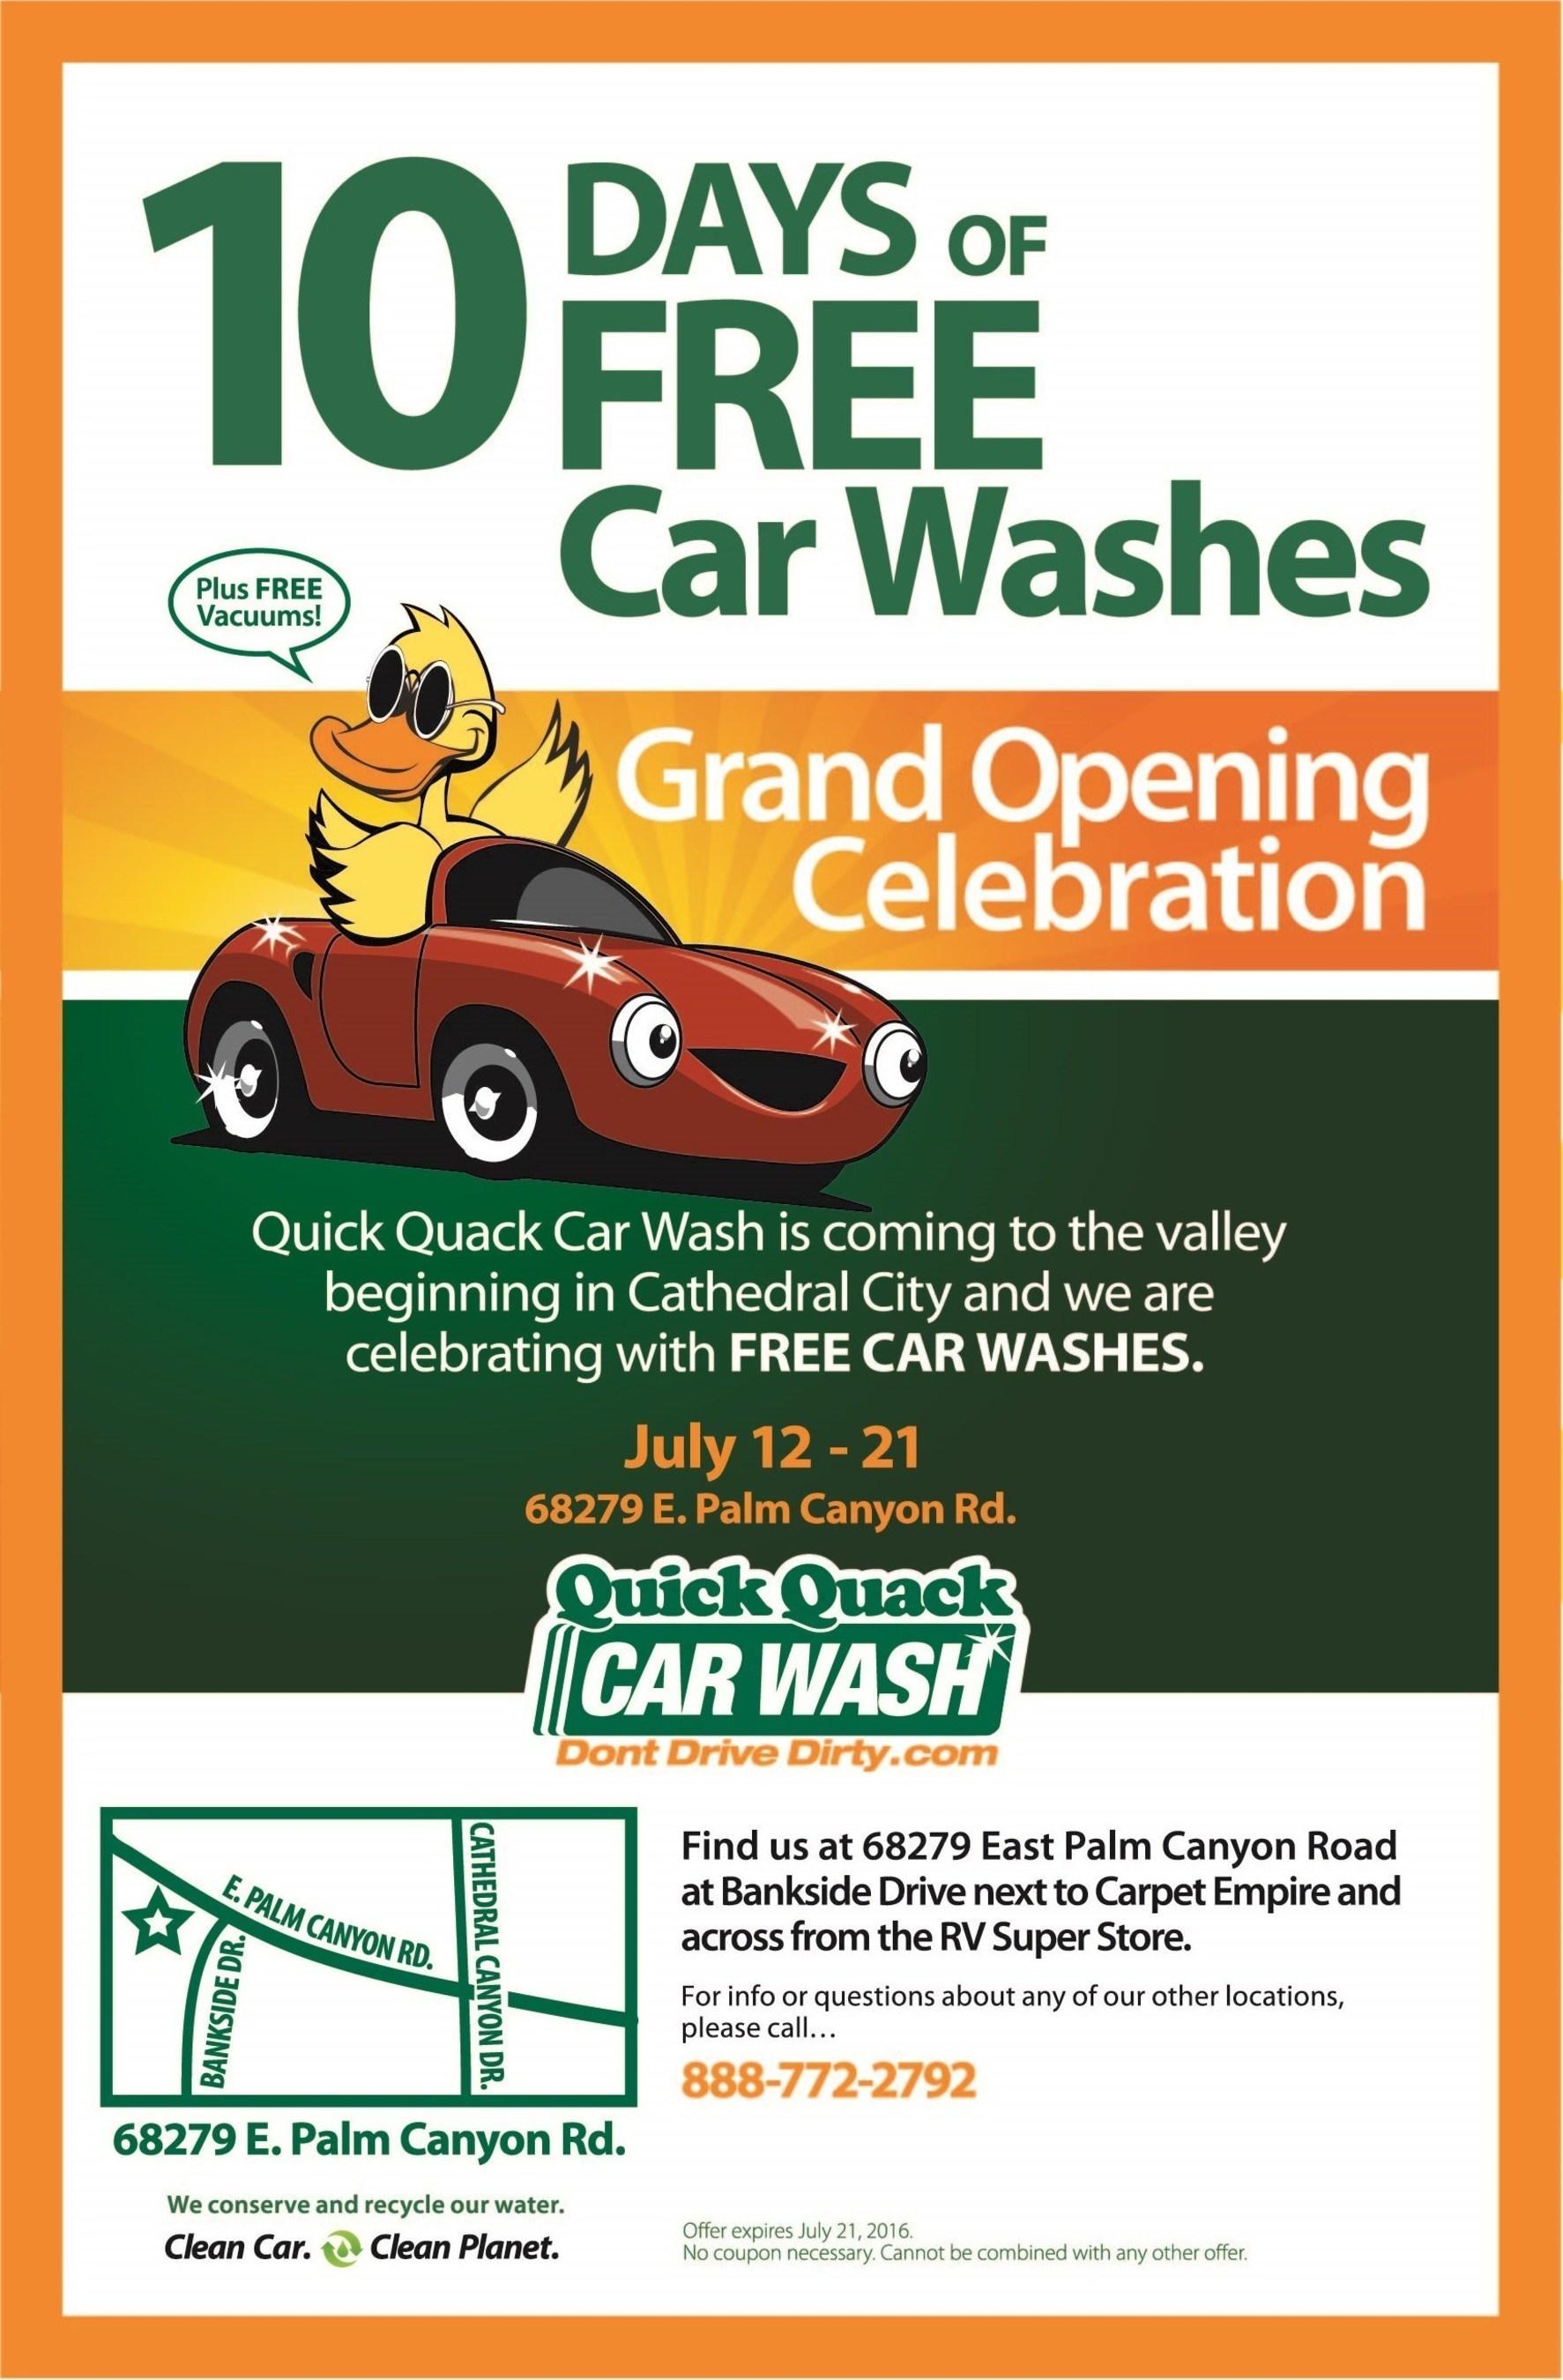 Quick Quack Car Wash Celebrates Cathedral City Location Acquisition